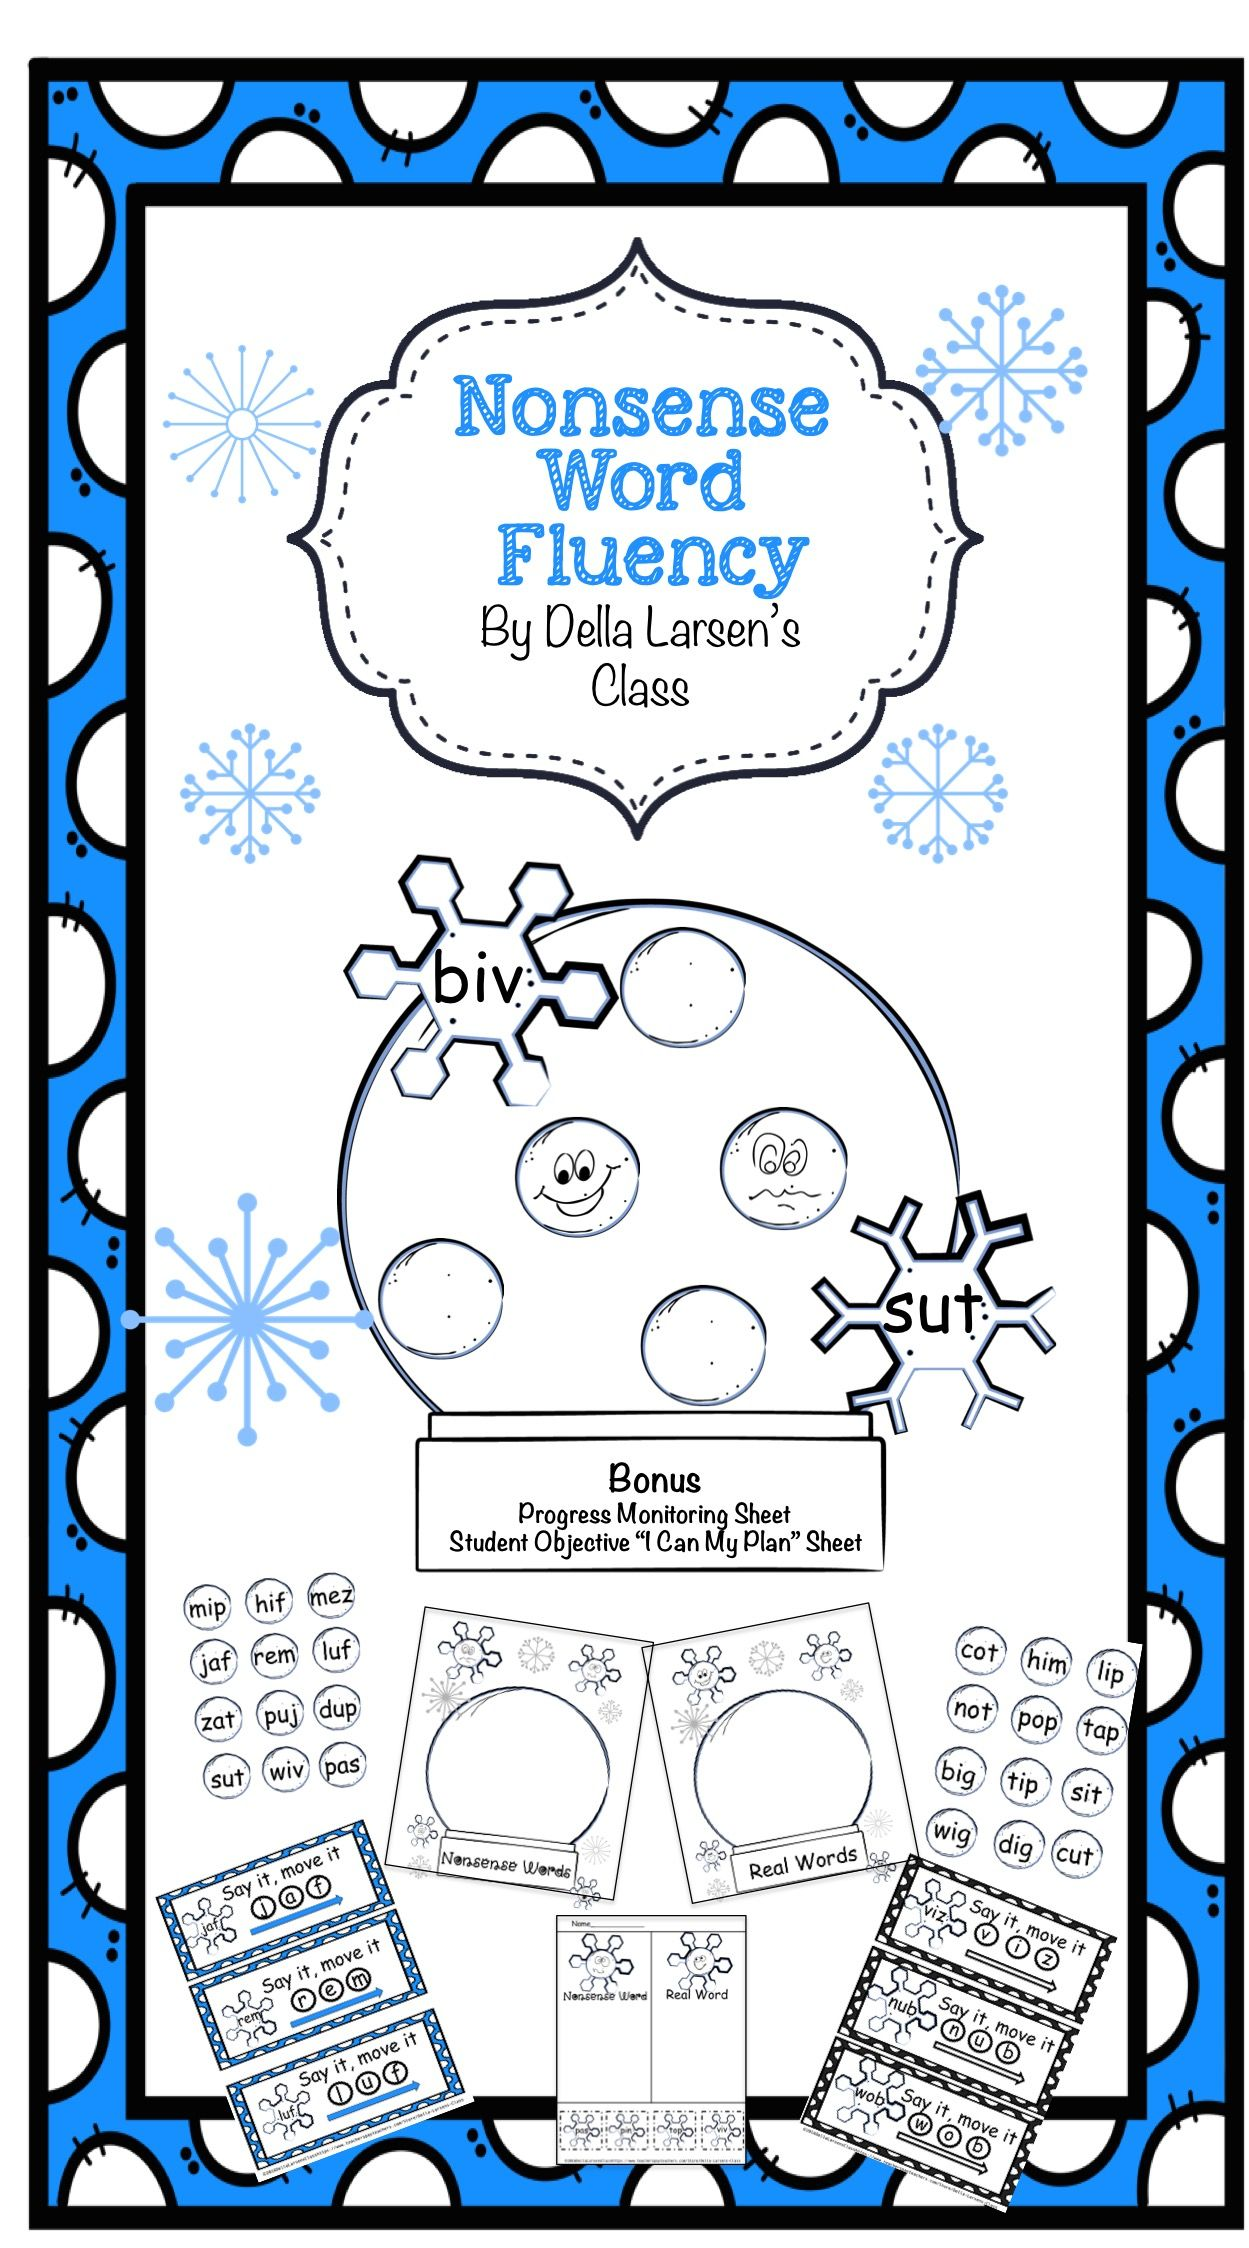 Nonsense Word Fluency With Bonus Classroom